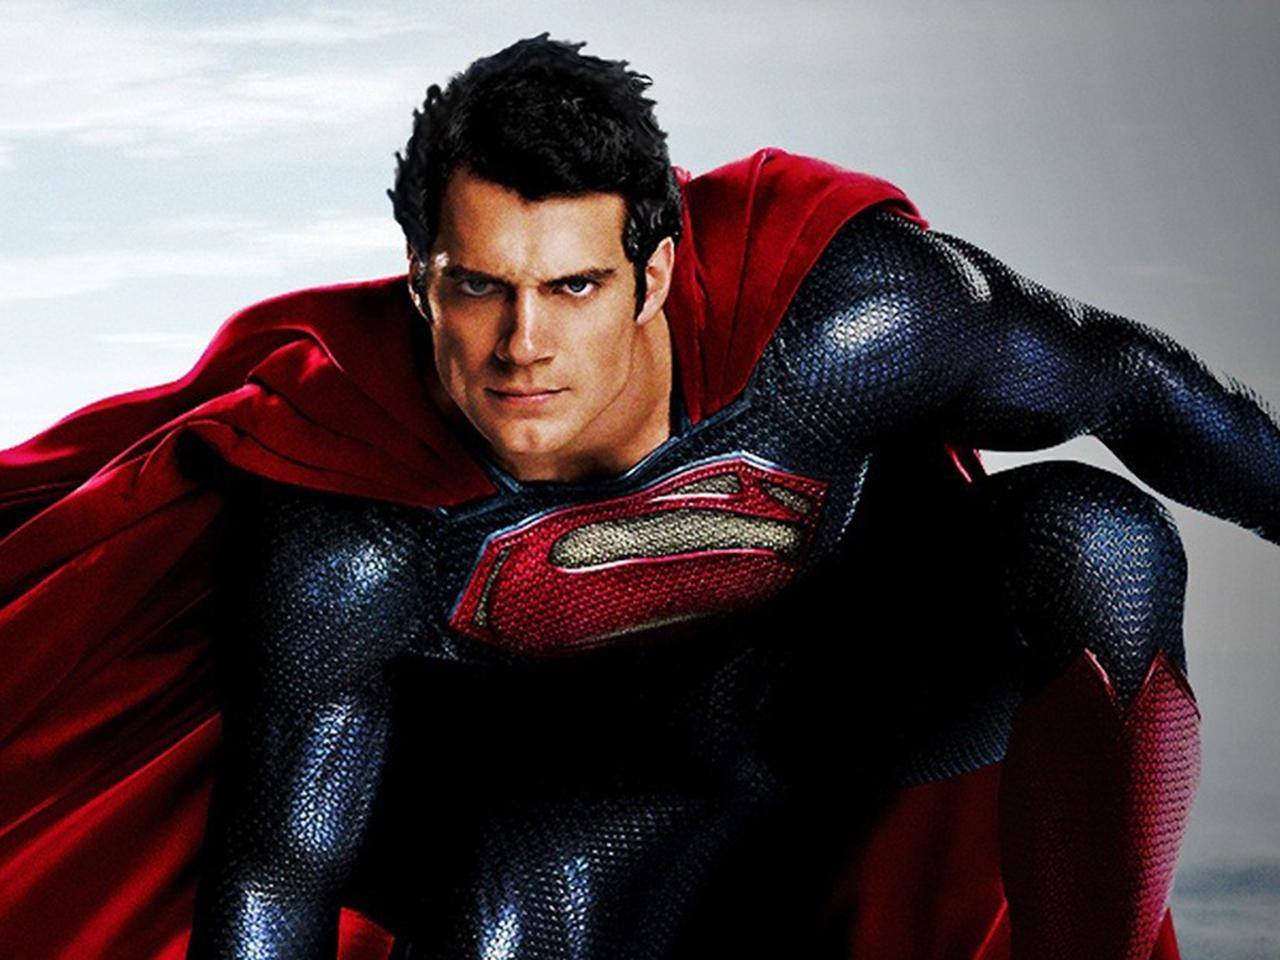 IMAGE: Superman